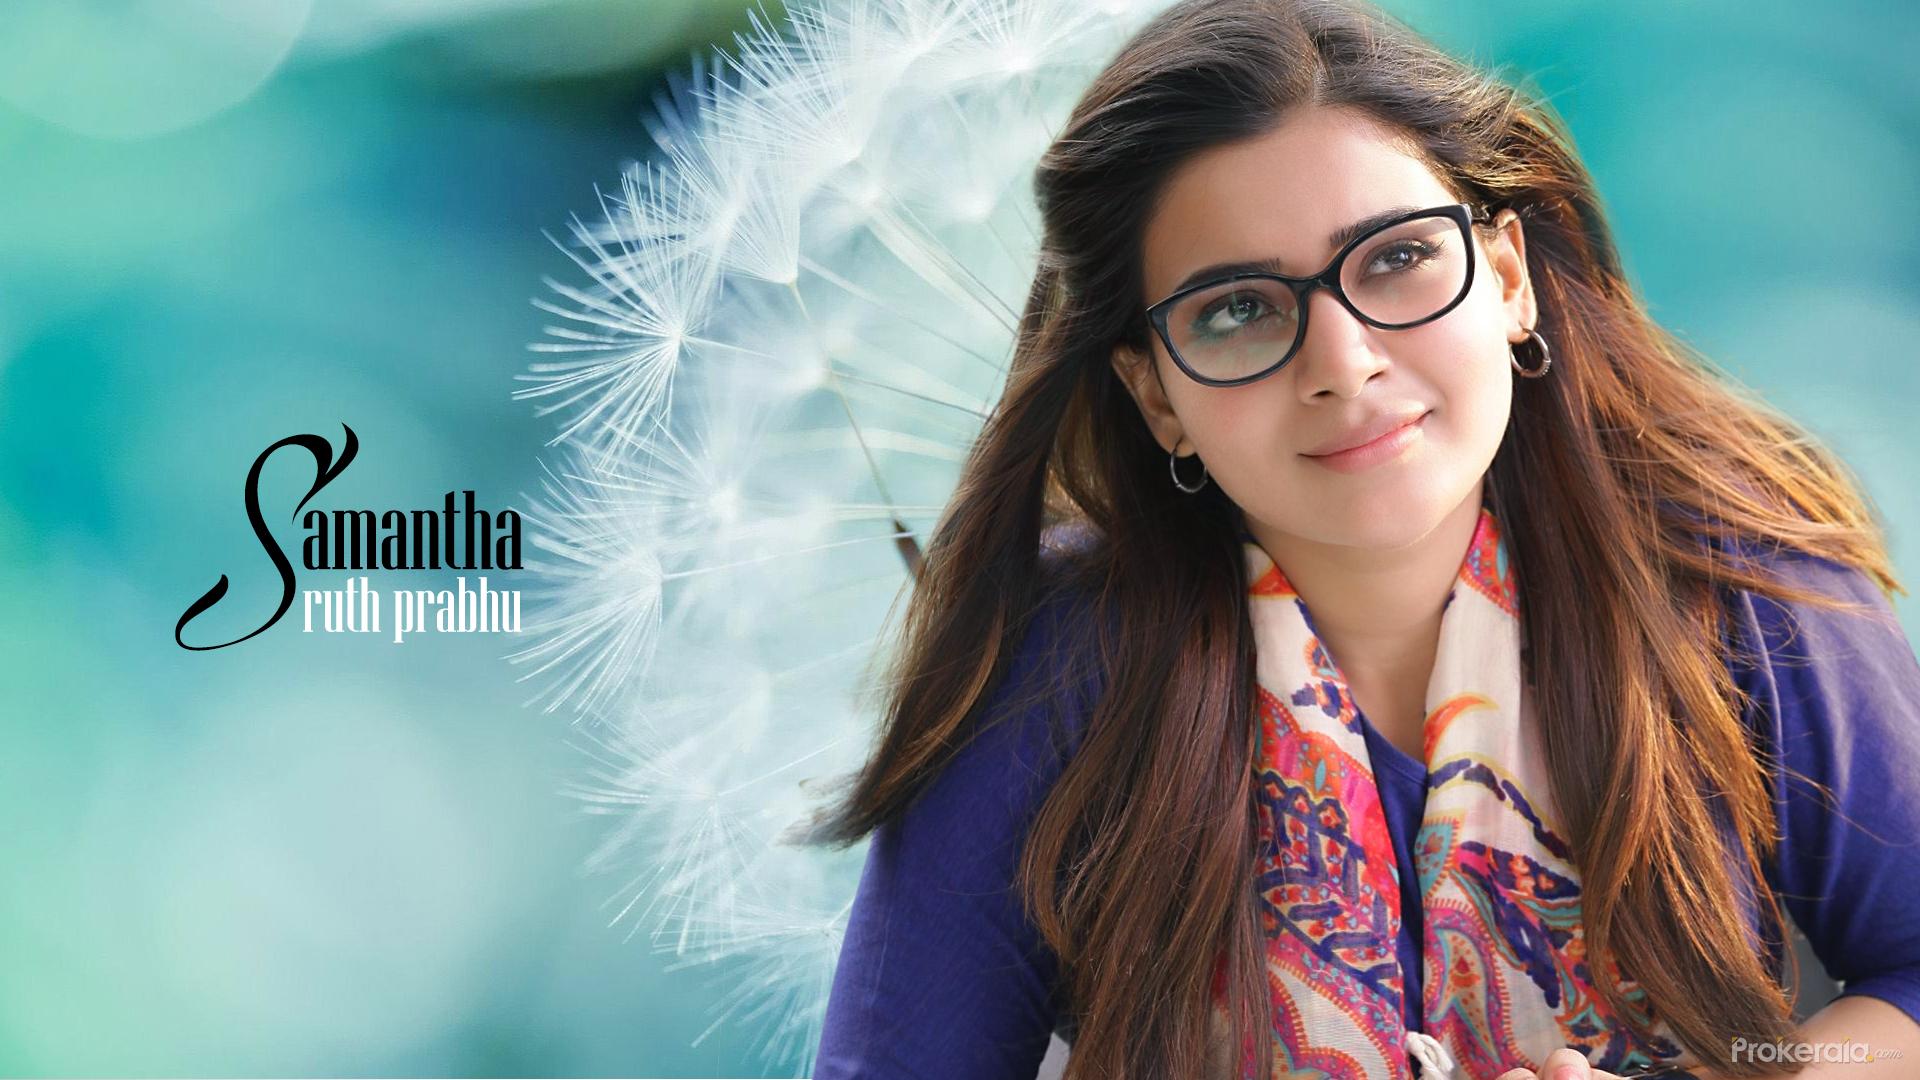 Download Samantha Ruth Prabhu Wallpaper 2 Hd Samantha Ruth Prabhu Wallpaper 2